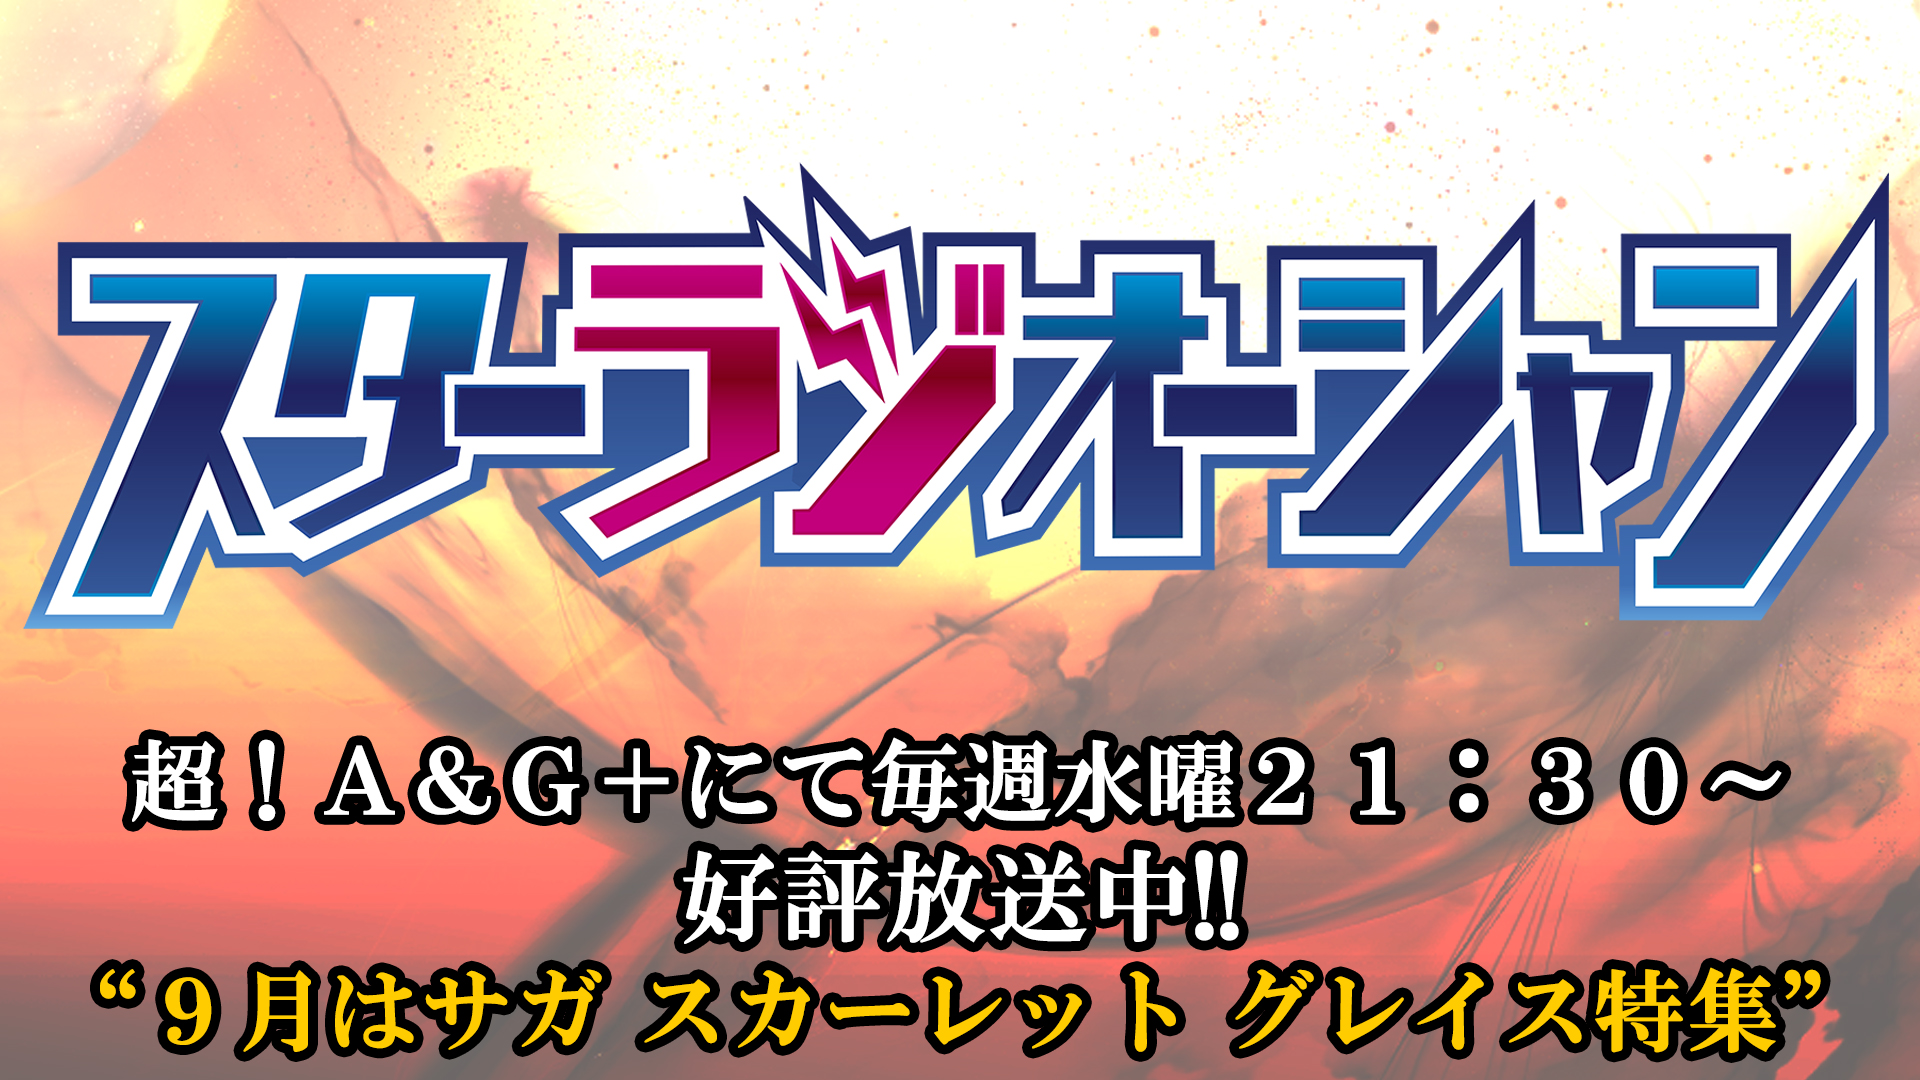 SAGASG_らじお.jpg